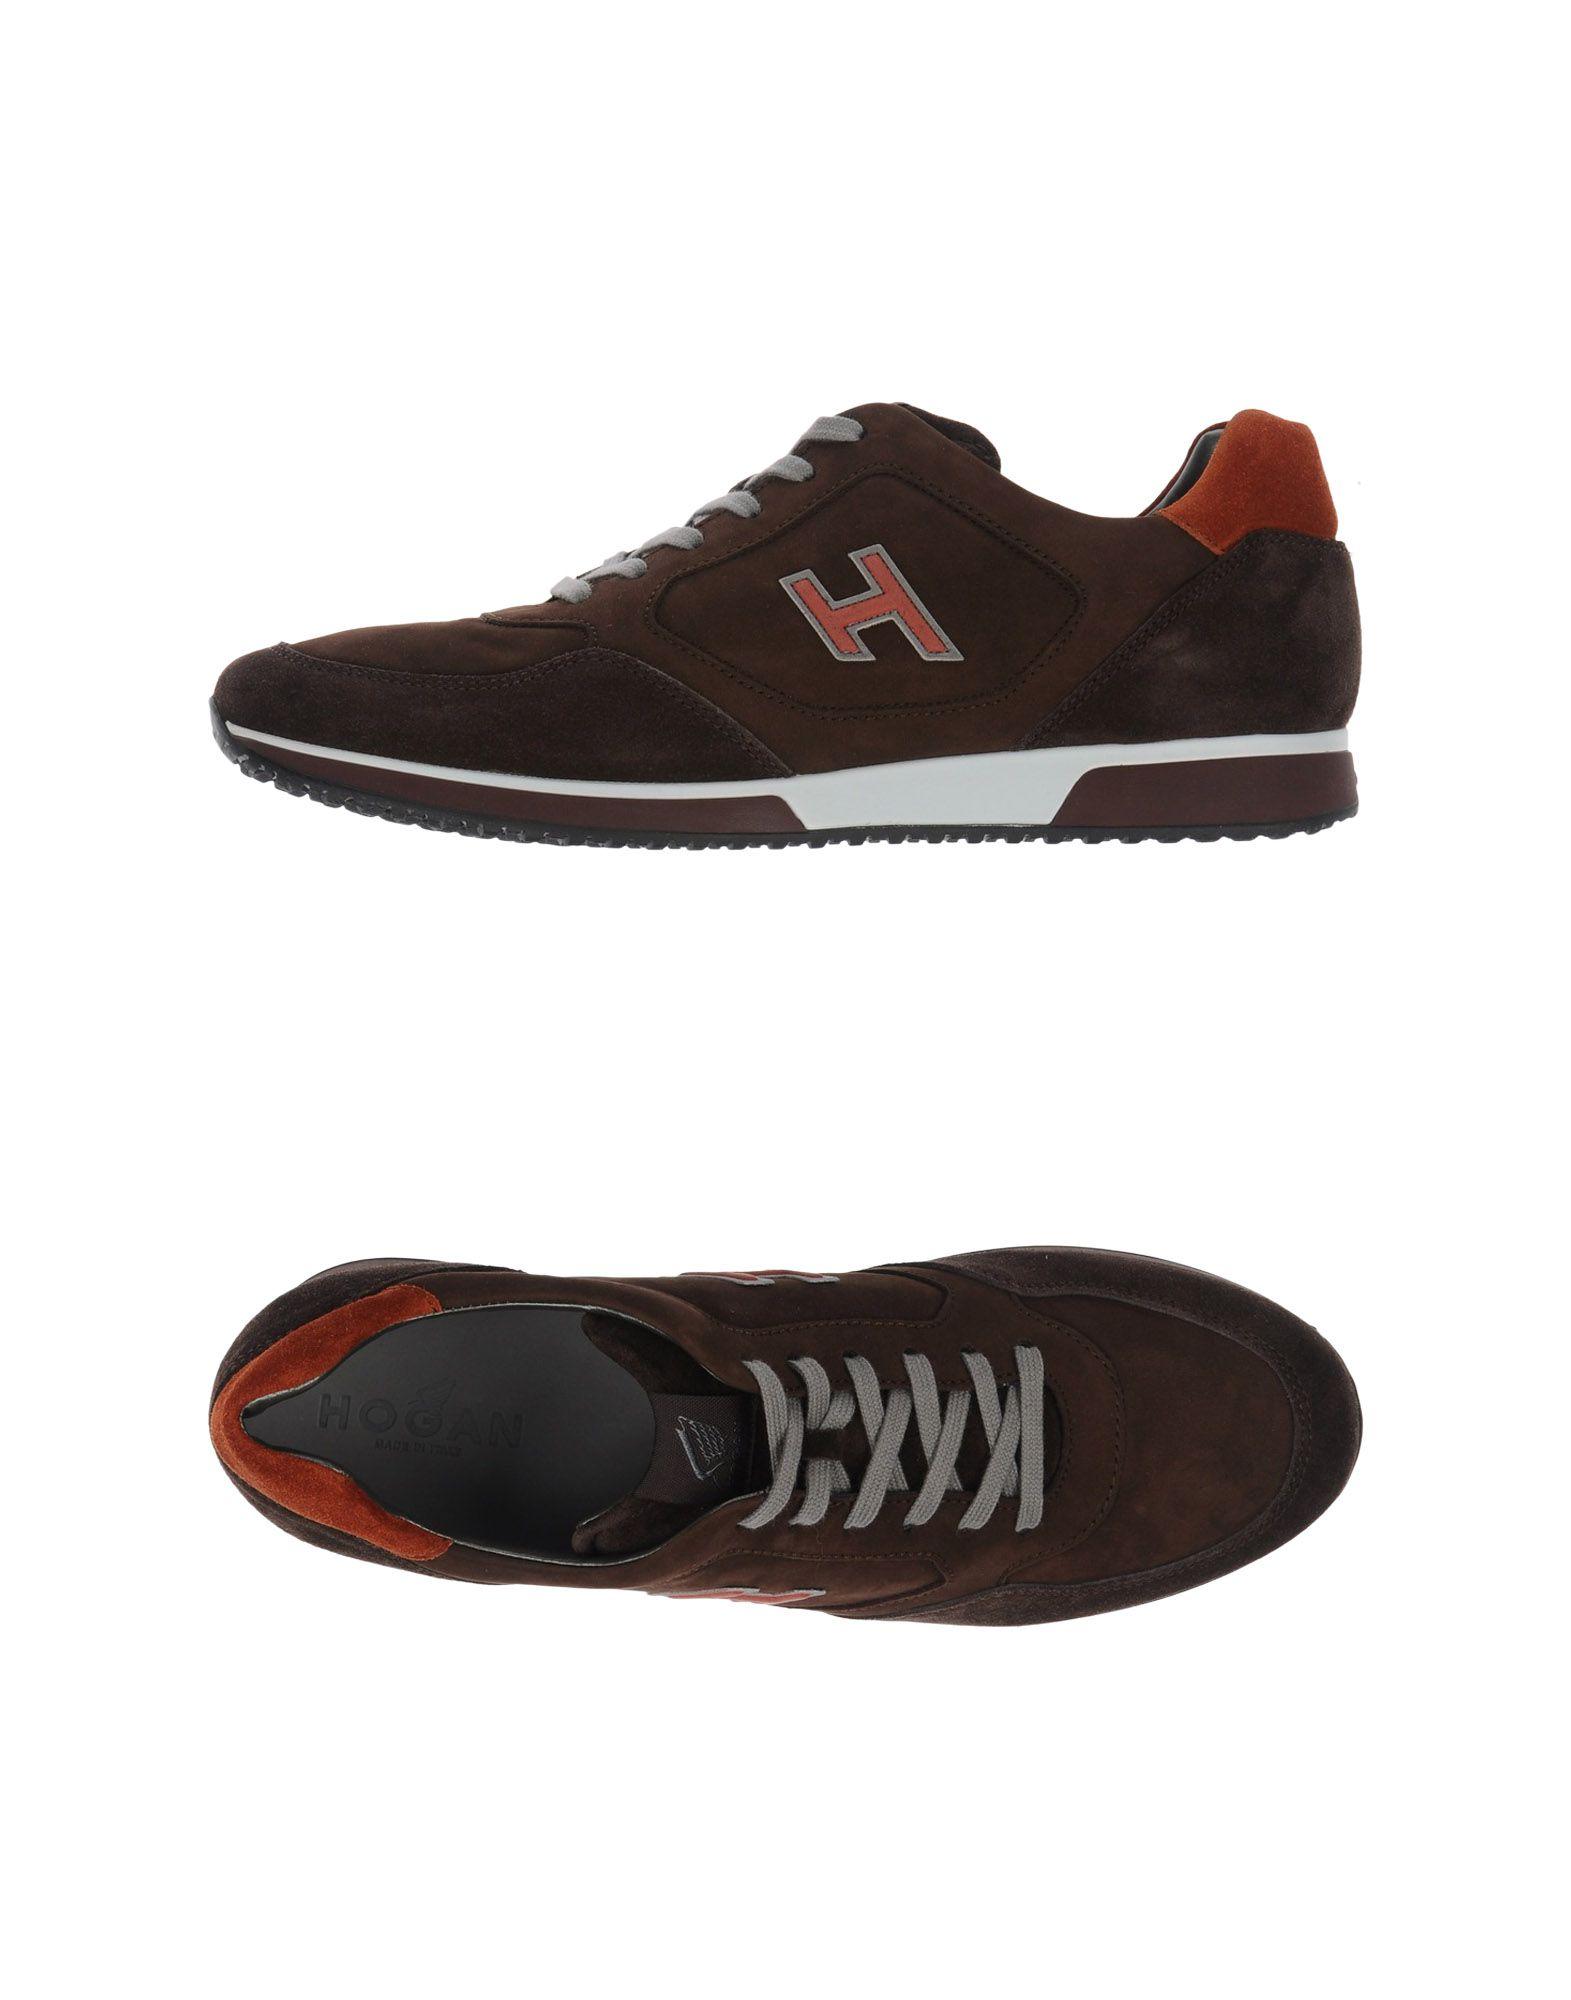 Hogan Sneakers Herren  44933478UO Schuhe Heiße Schuhe 44933478UO 827c8a